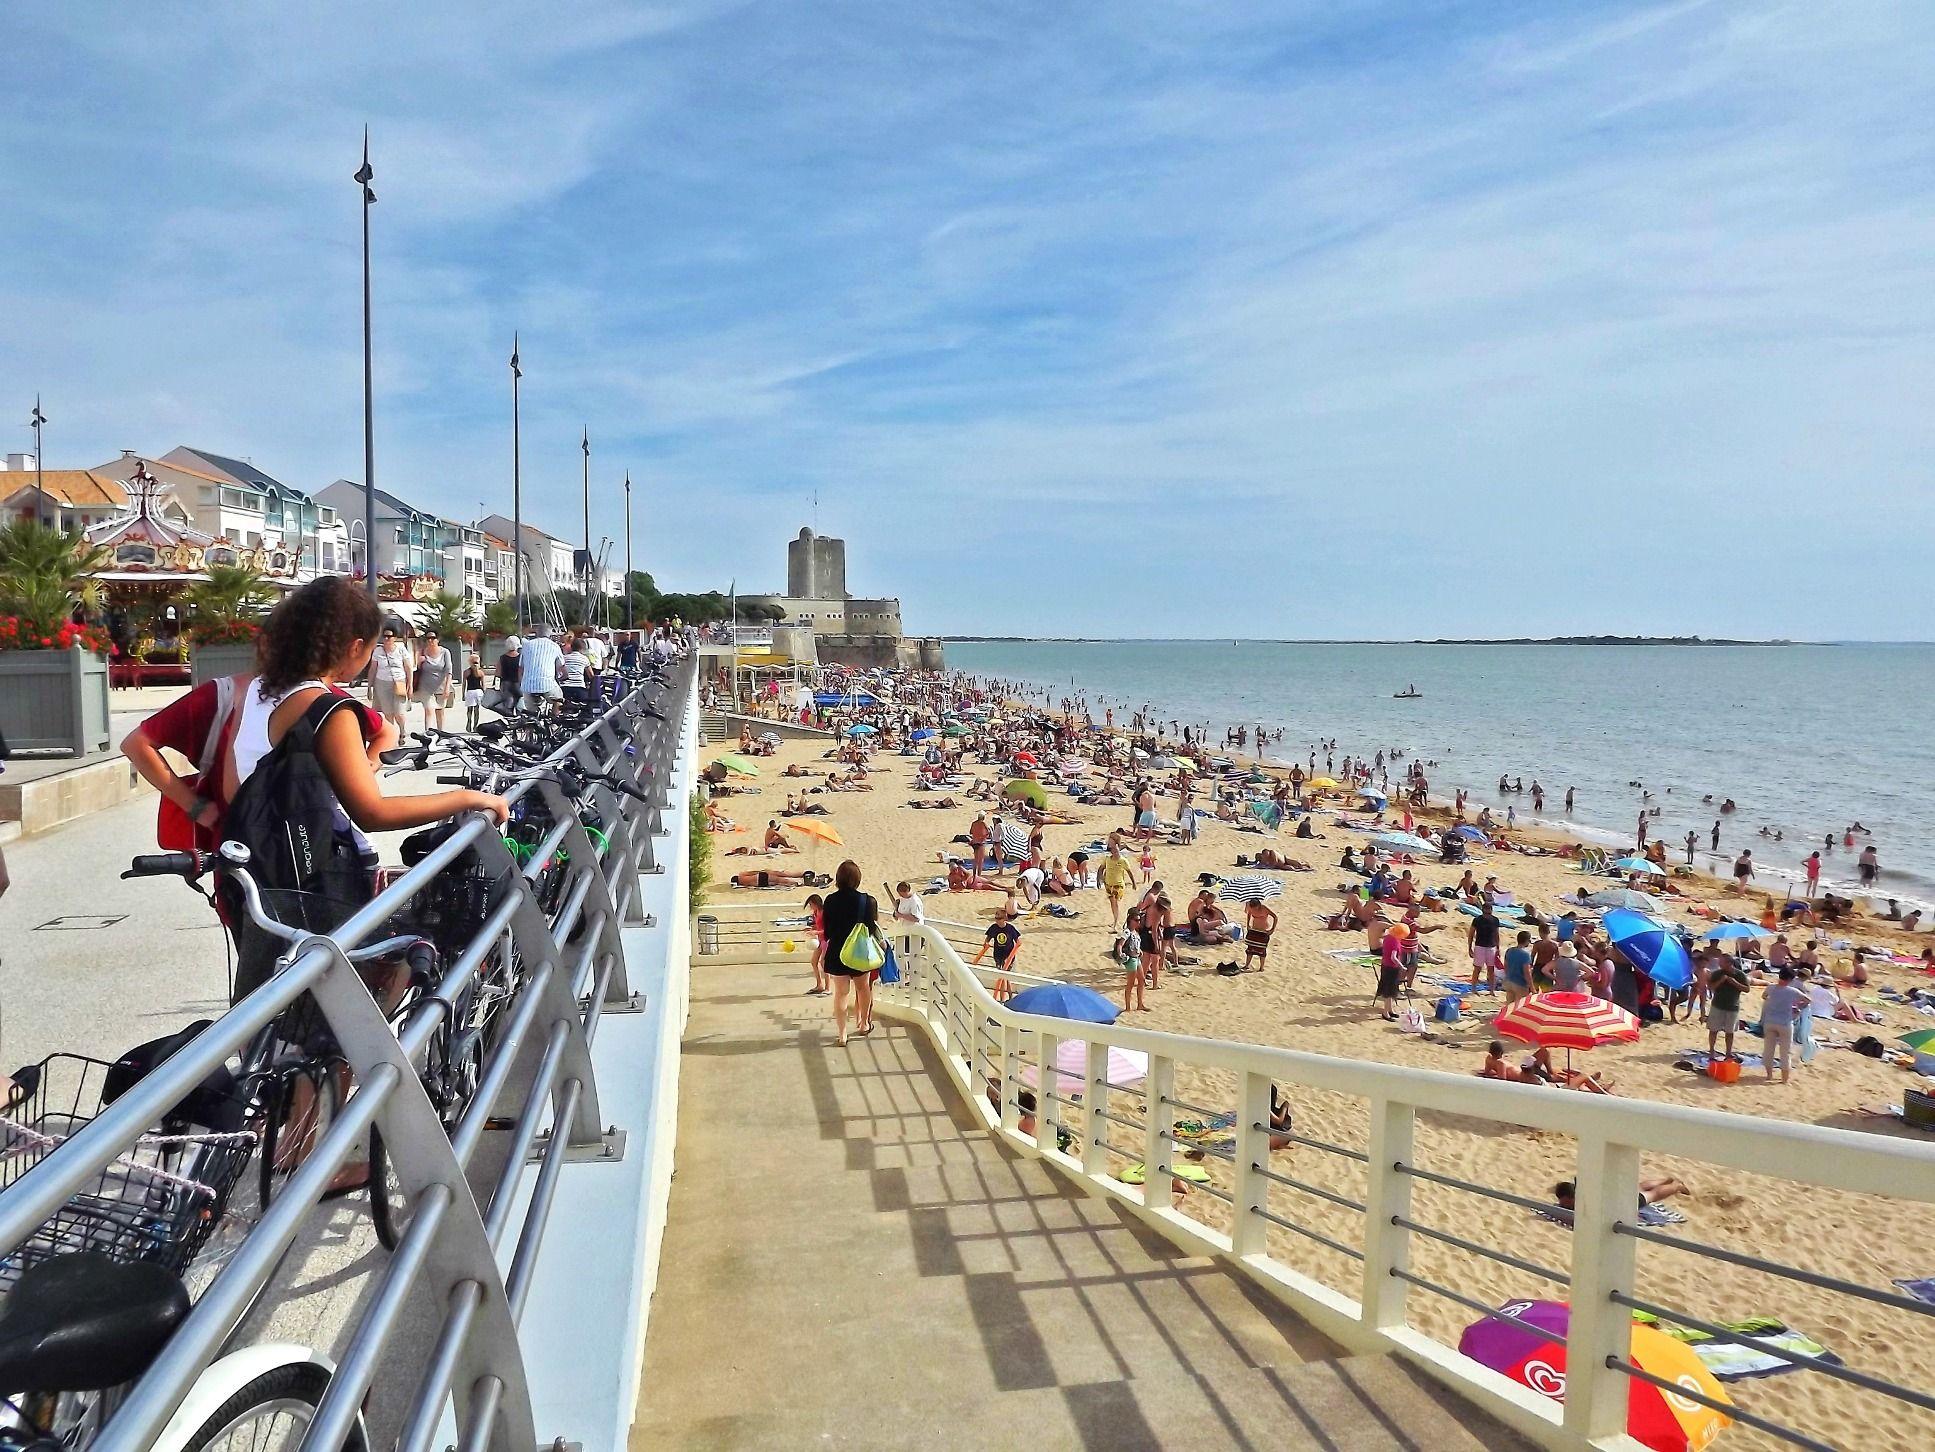 Grande plage fouras ete baignade vacances summer - Office du tourisme poitou charentes ...